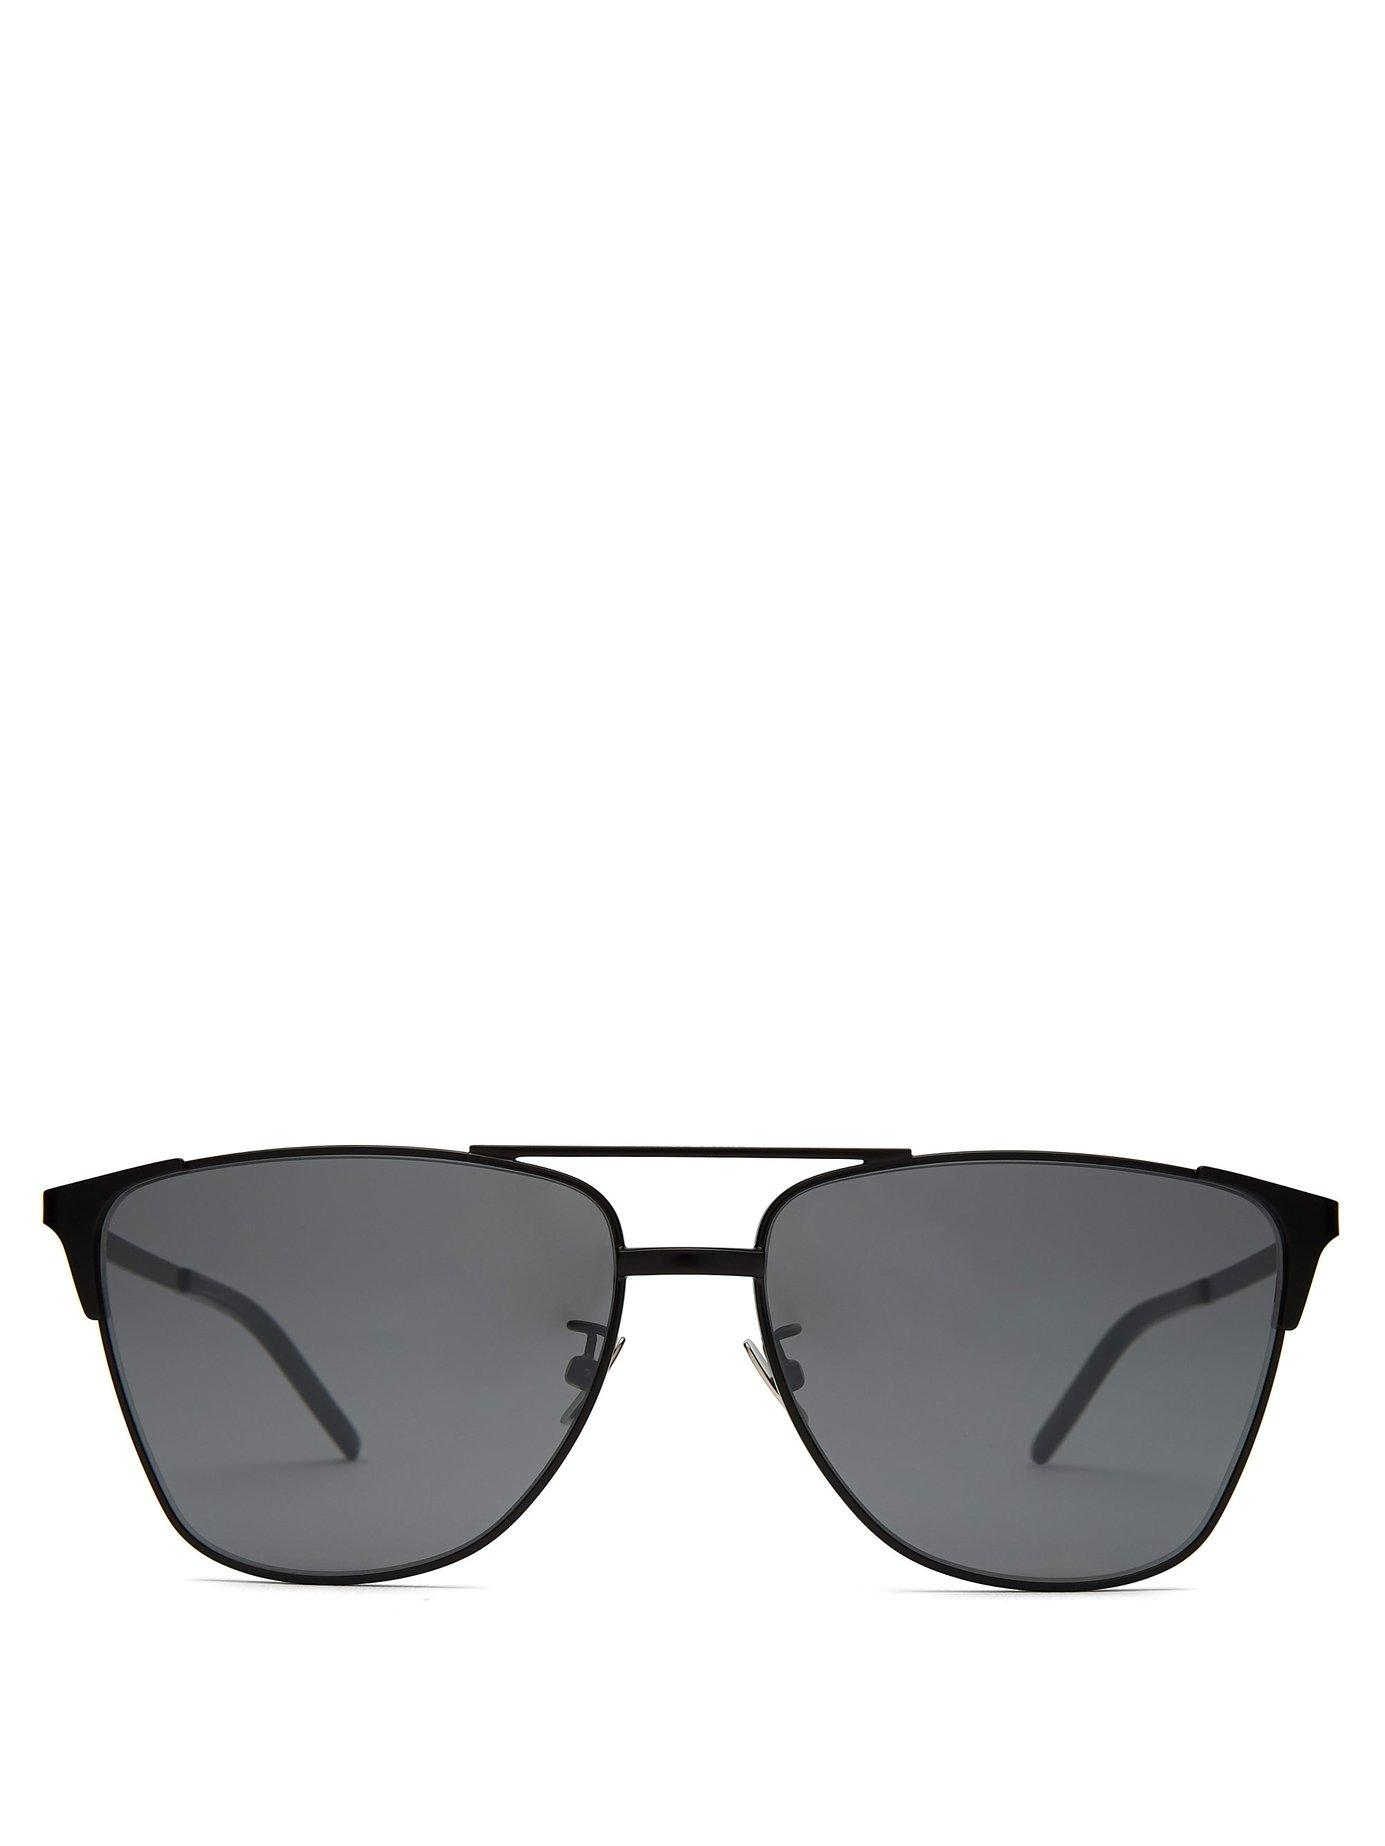 9f6f5275333d Lyst - Saint Laurent D Frame Metal Sunglasses in Metallic for Men